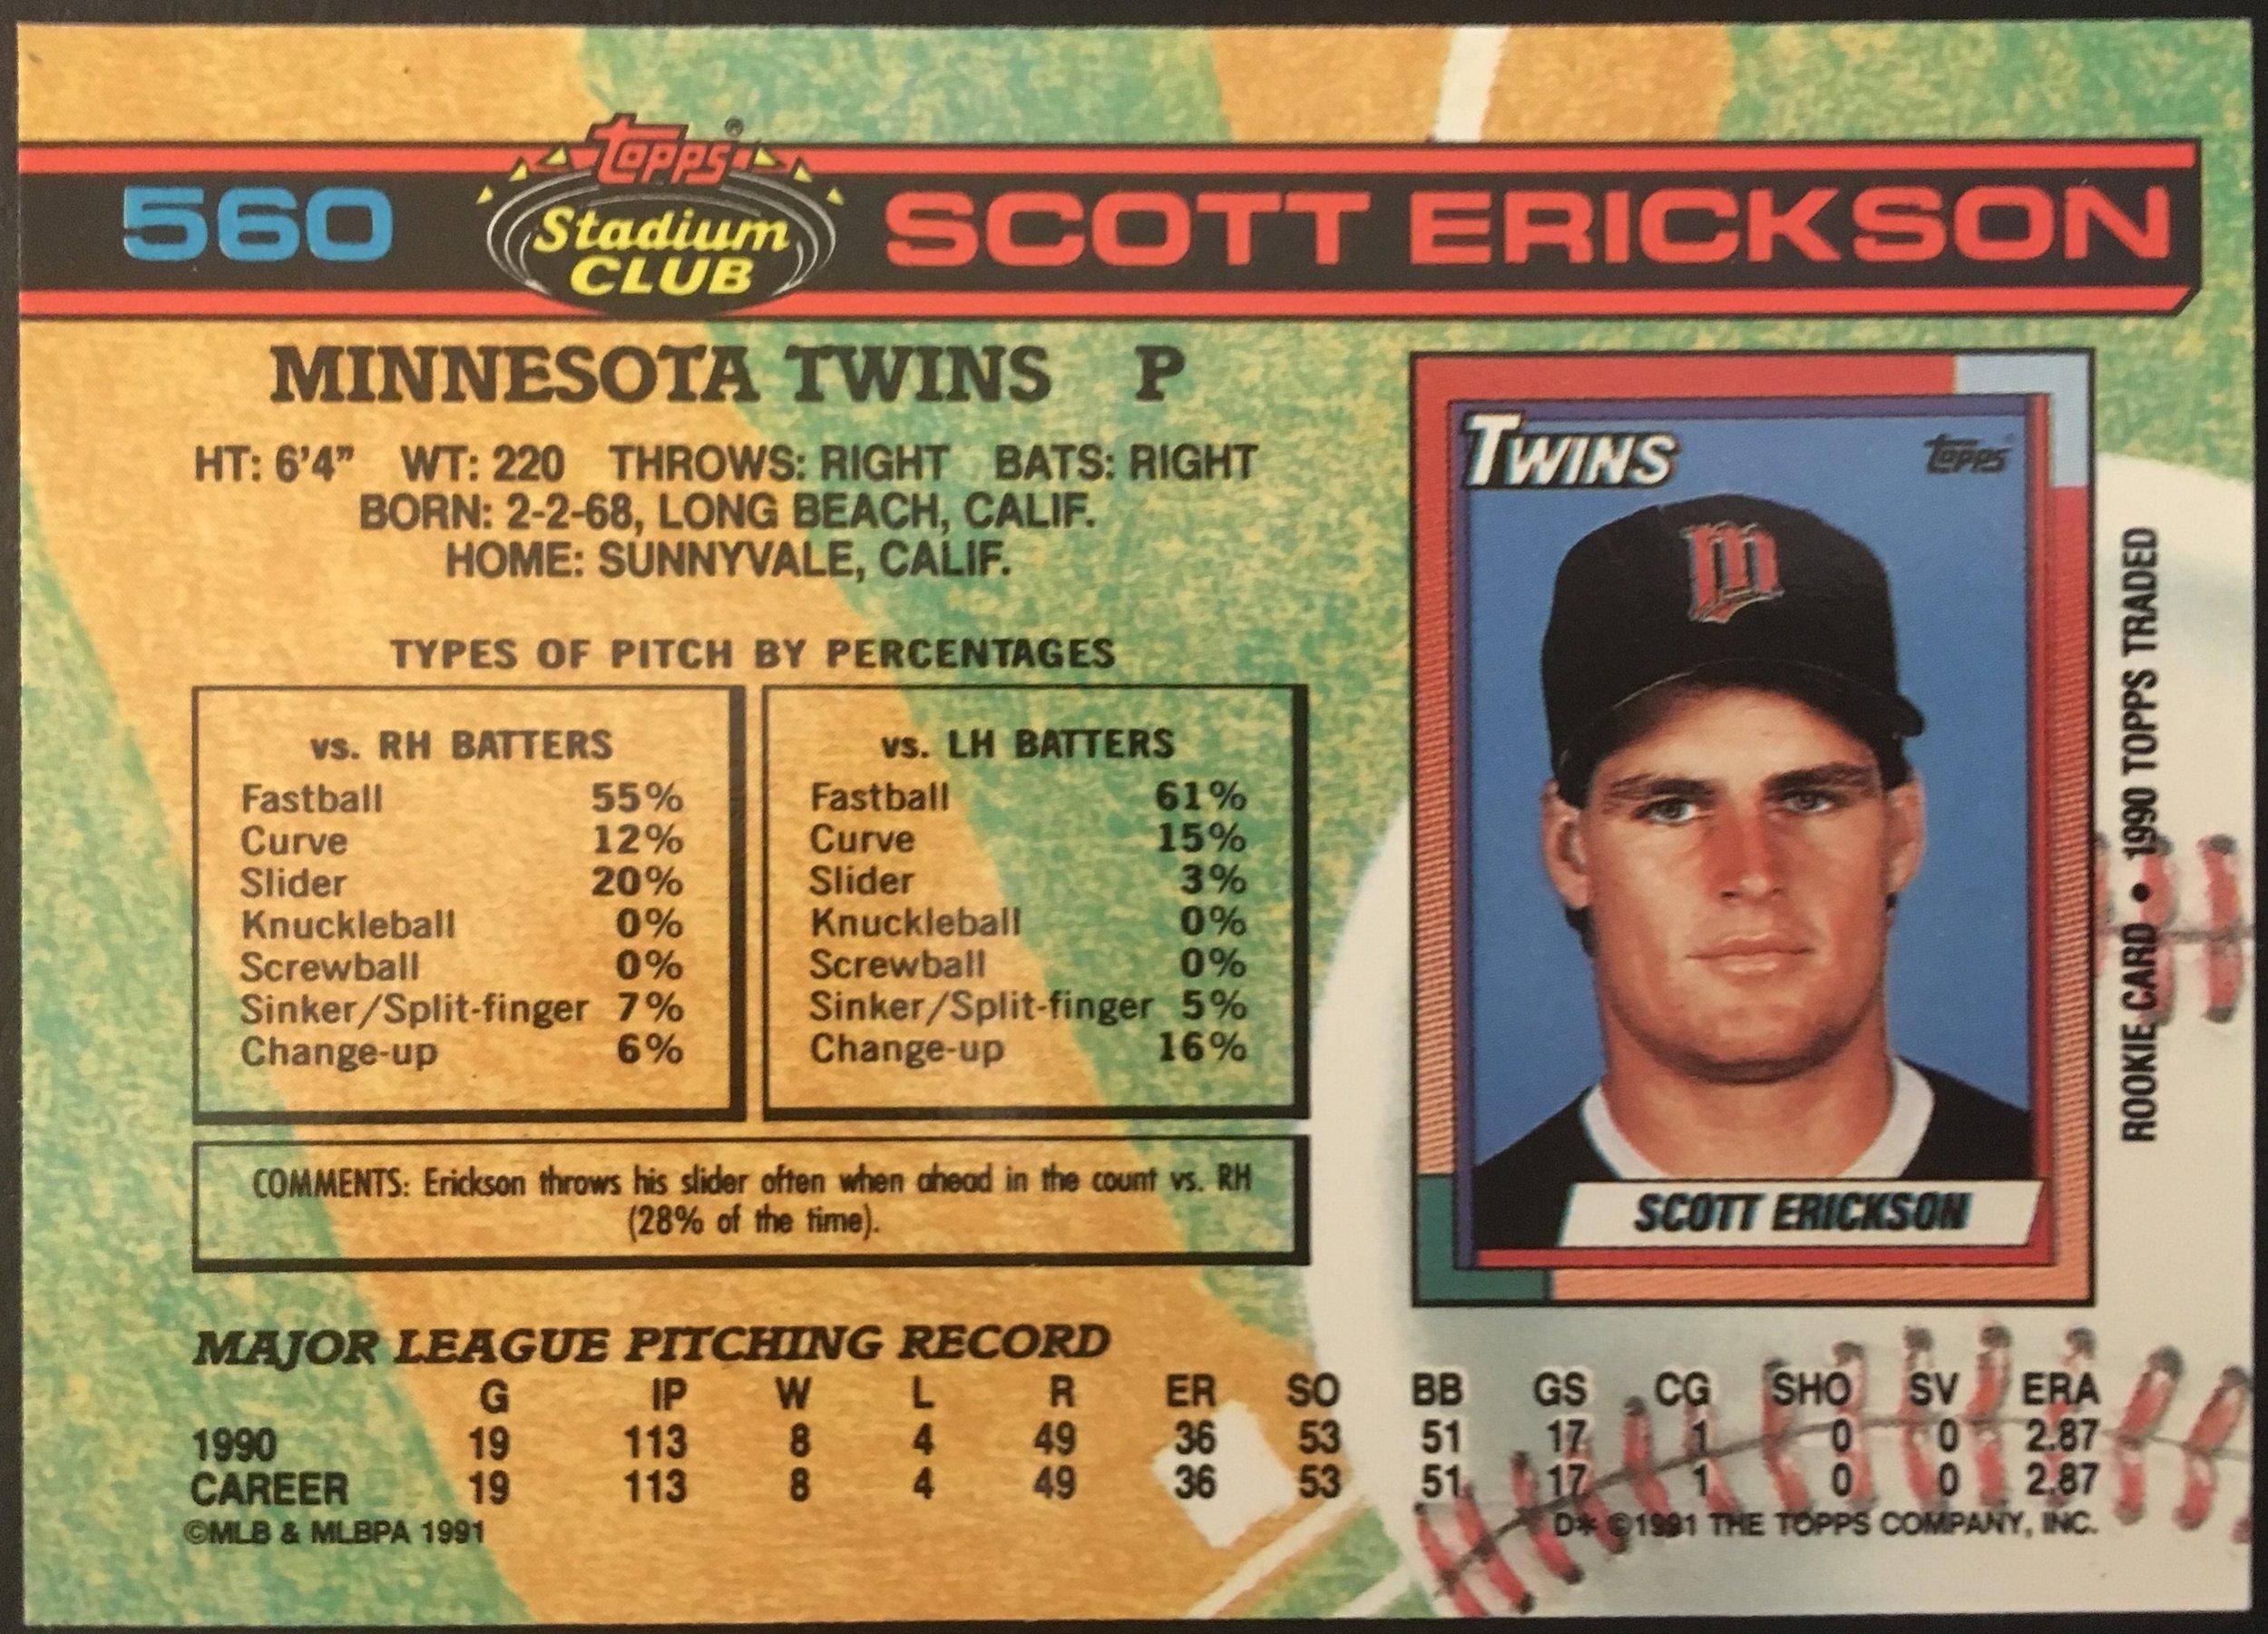 1991-Scott-Erickson-Stadium-Club.JPG